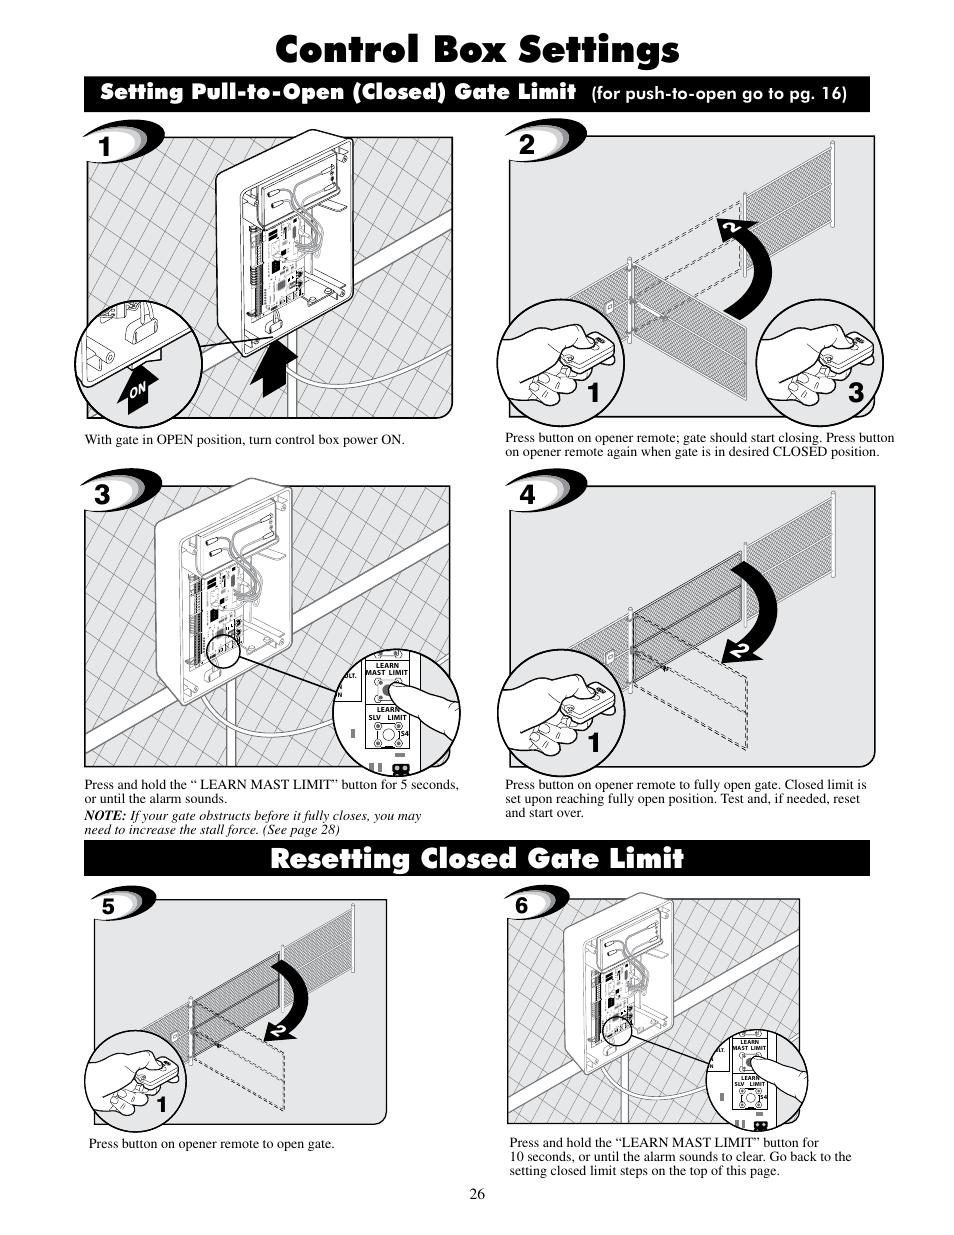 Control box settings, Resetting closed gate limit, Setting